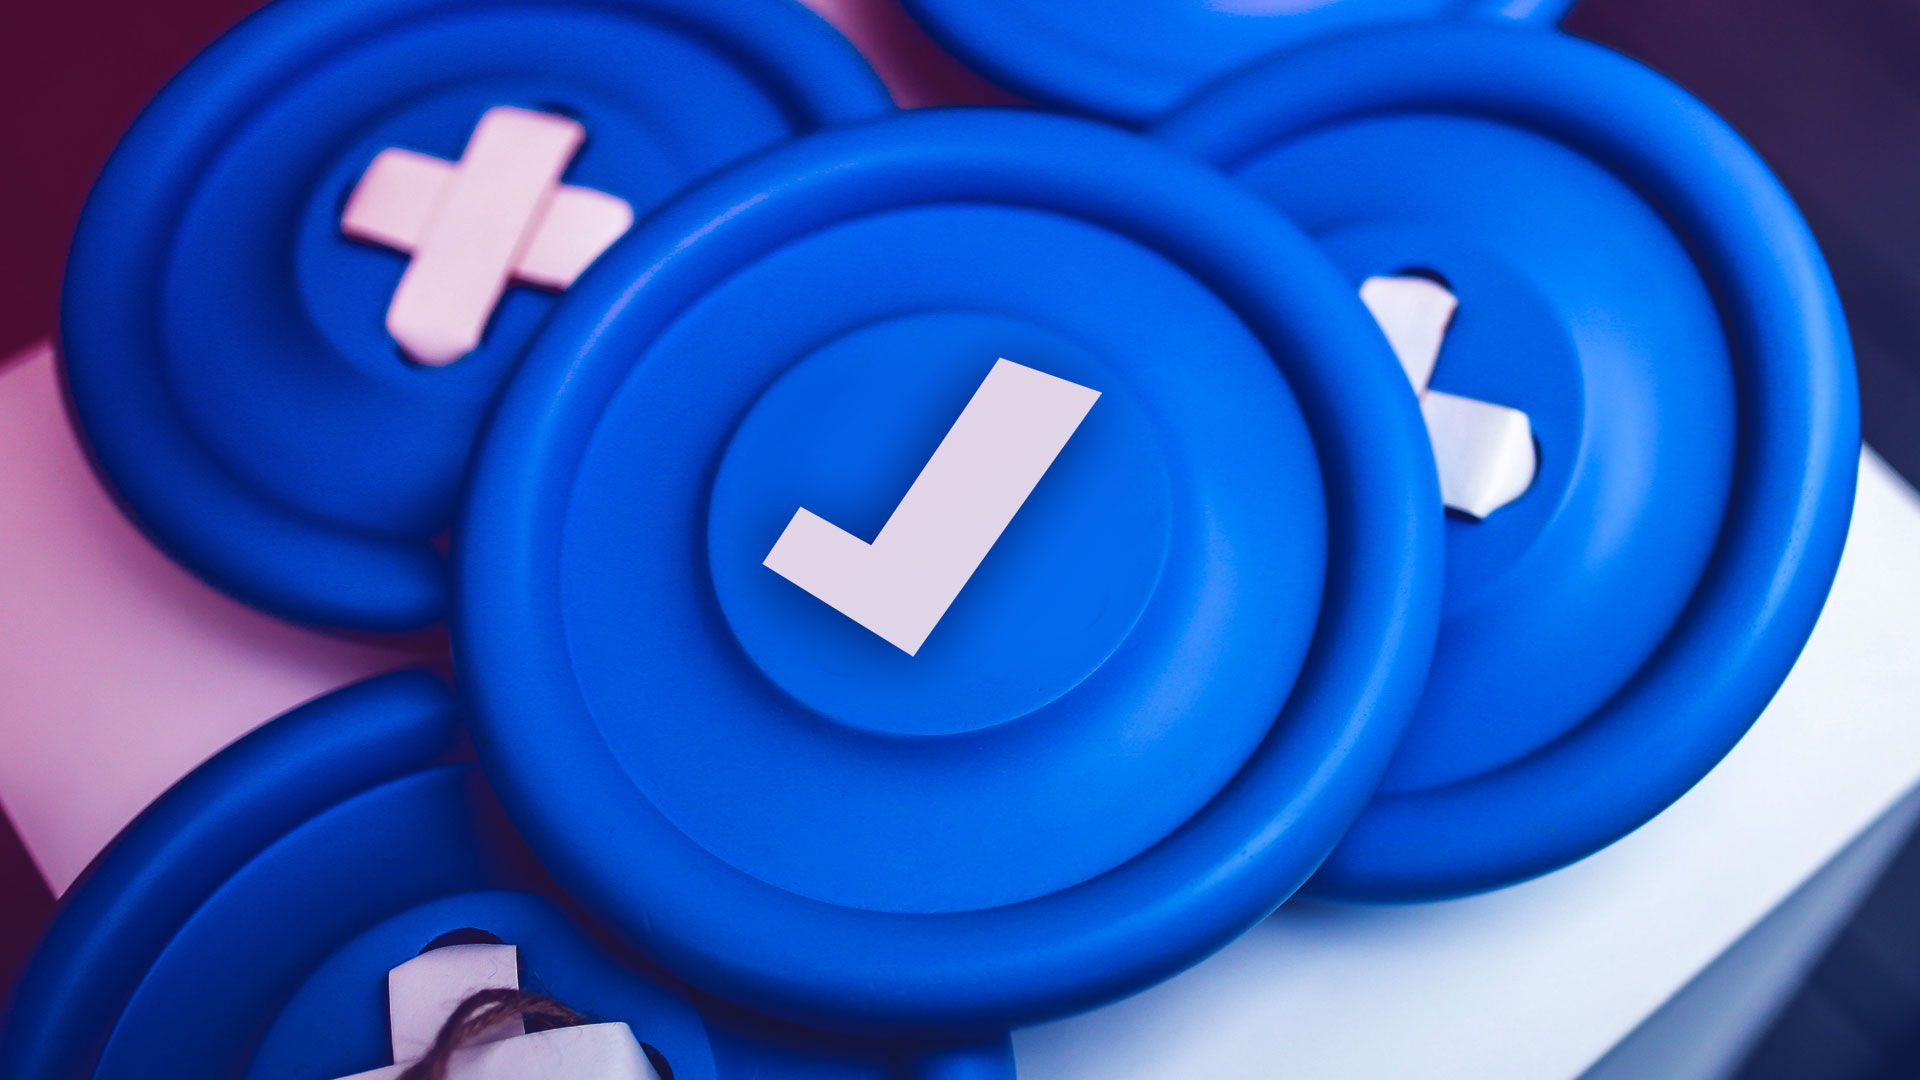 Facebook Seite verifizieren - Schritt für Schritt Anleitung